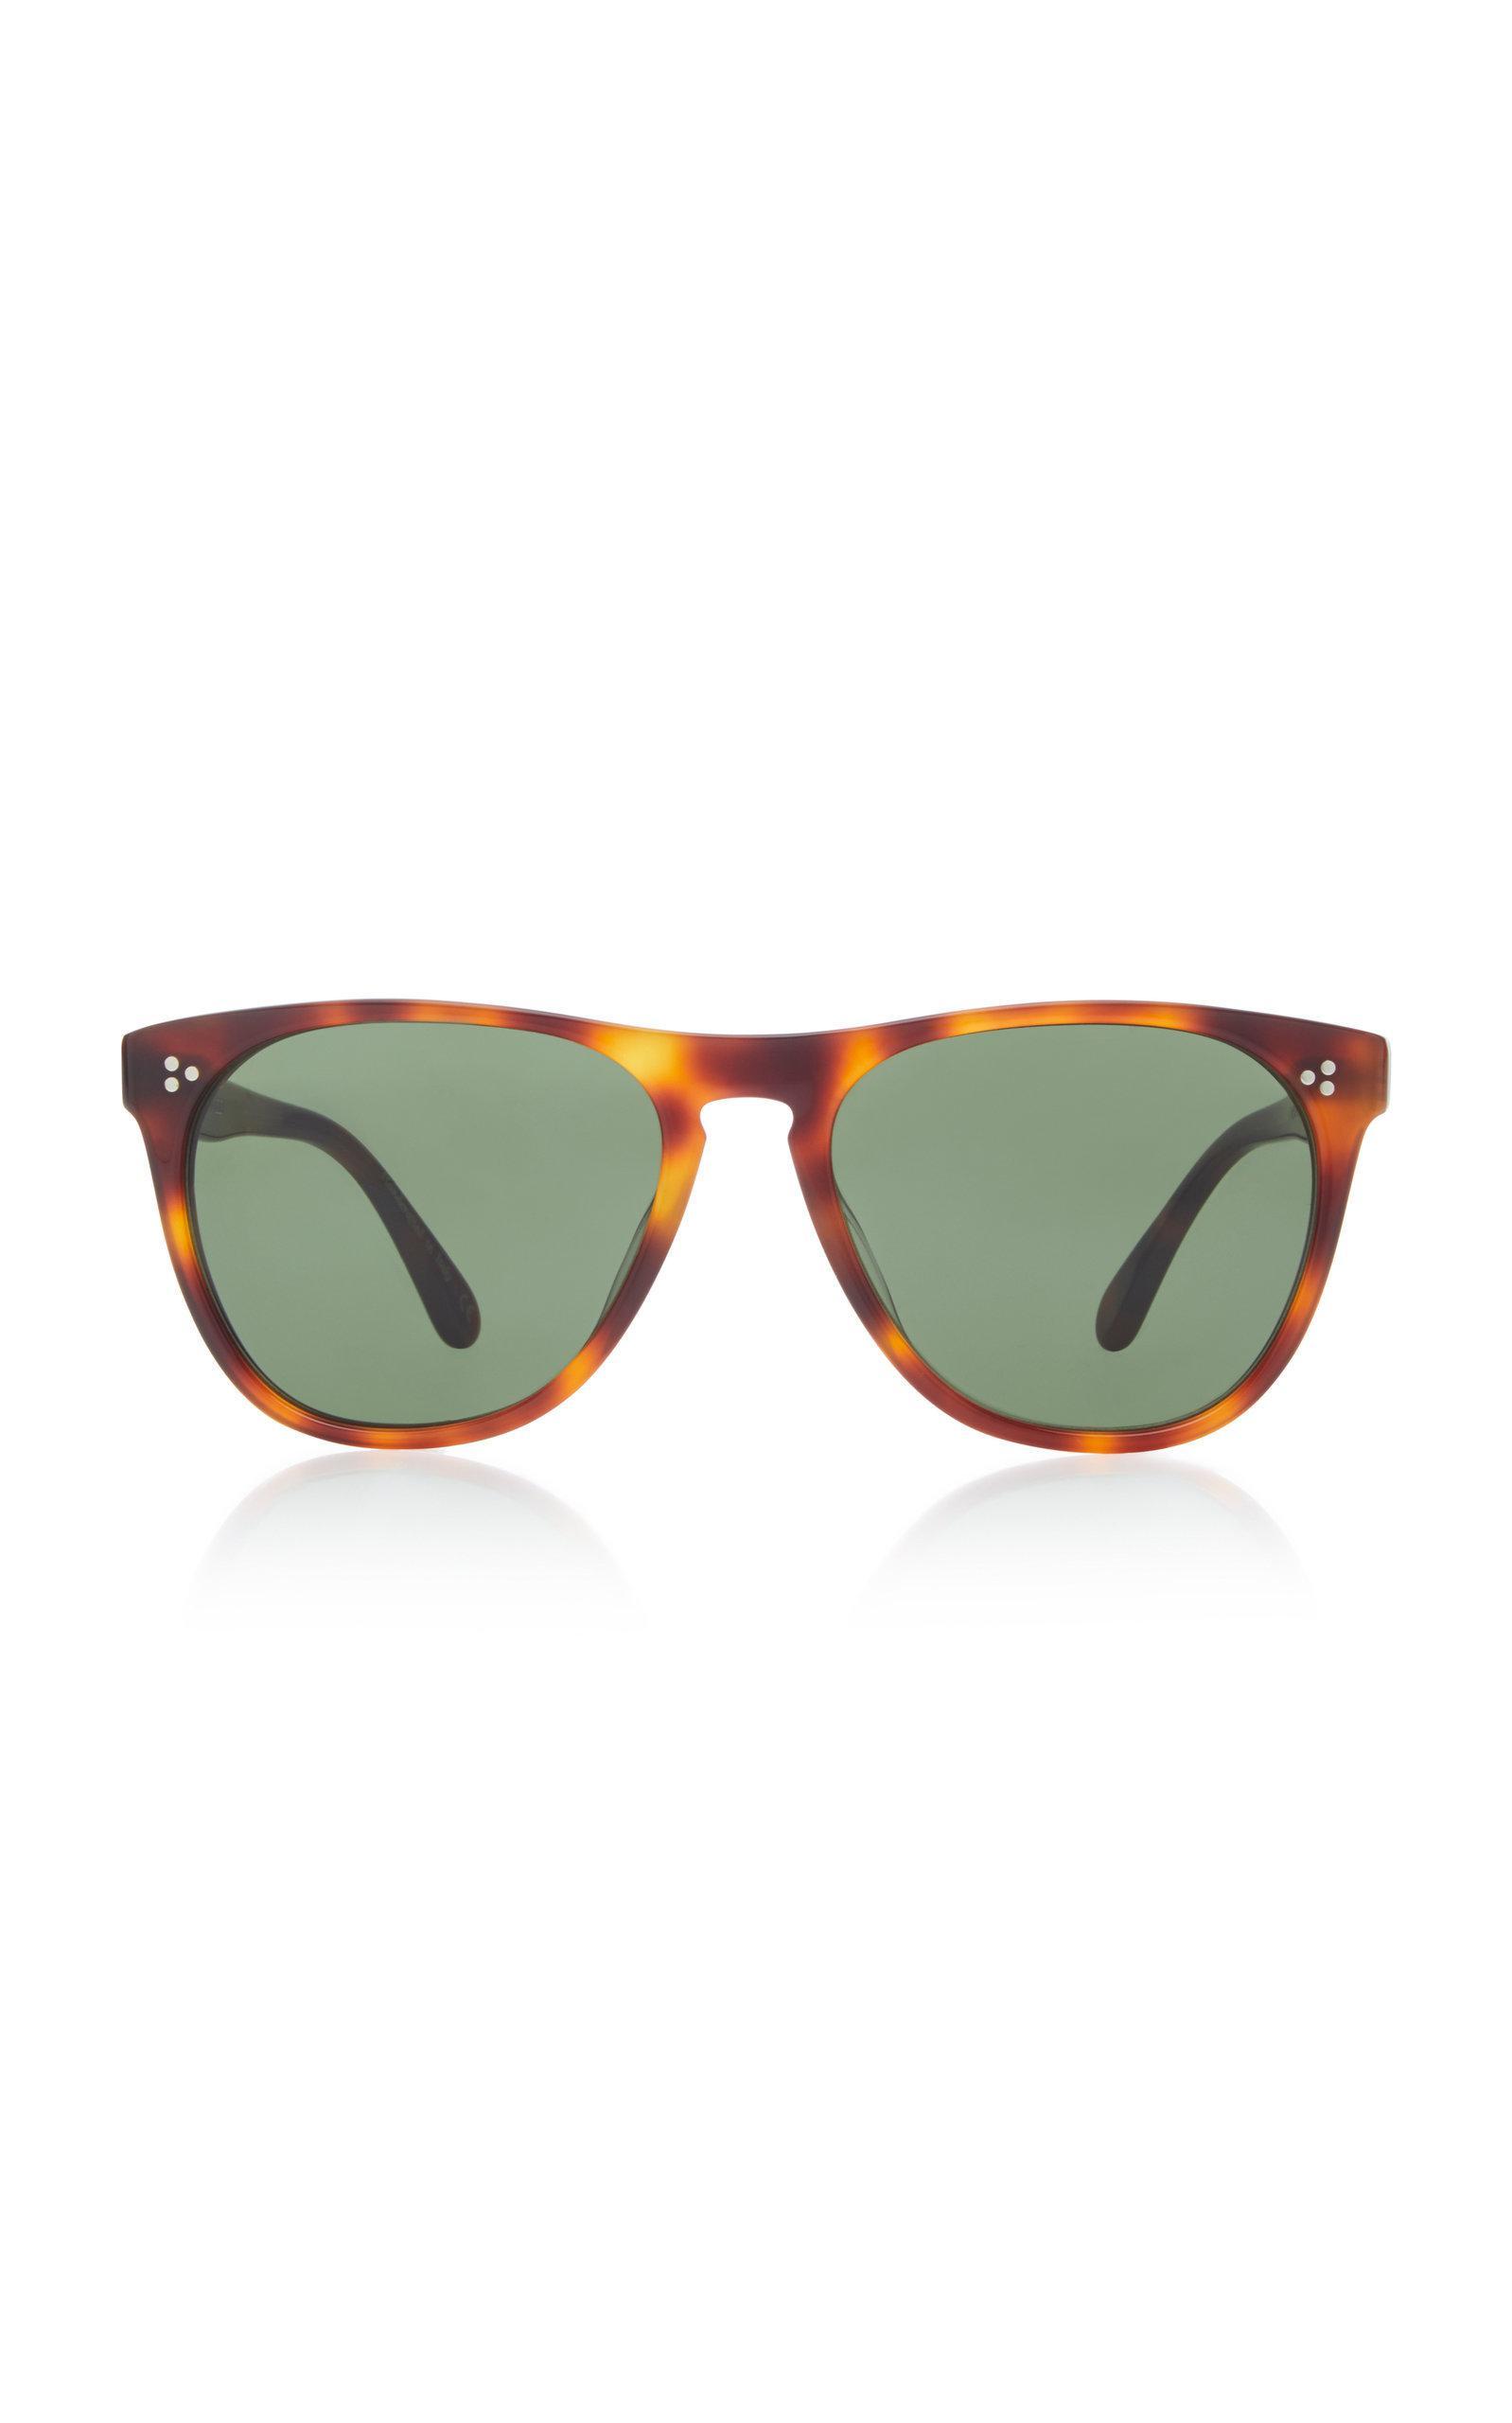 175b3707959 Oliver Peoples Daddy B. Square Sunglasses In Brown. Moda Operandi